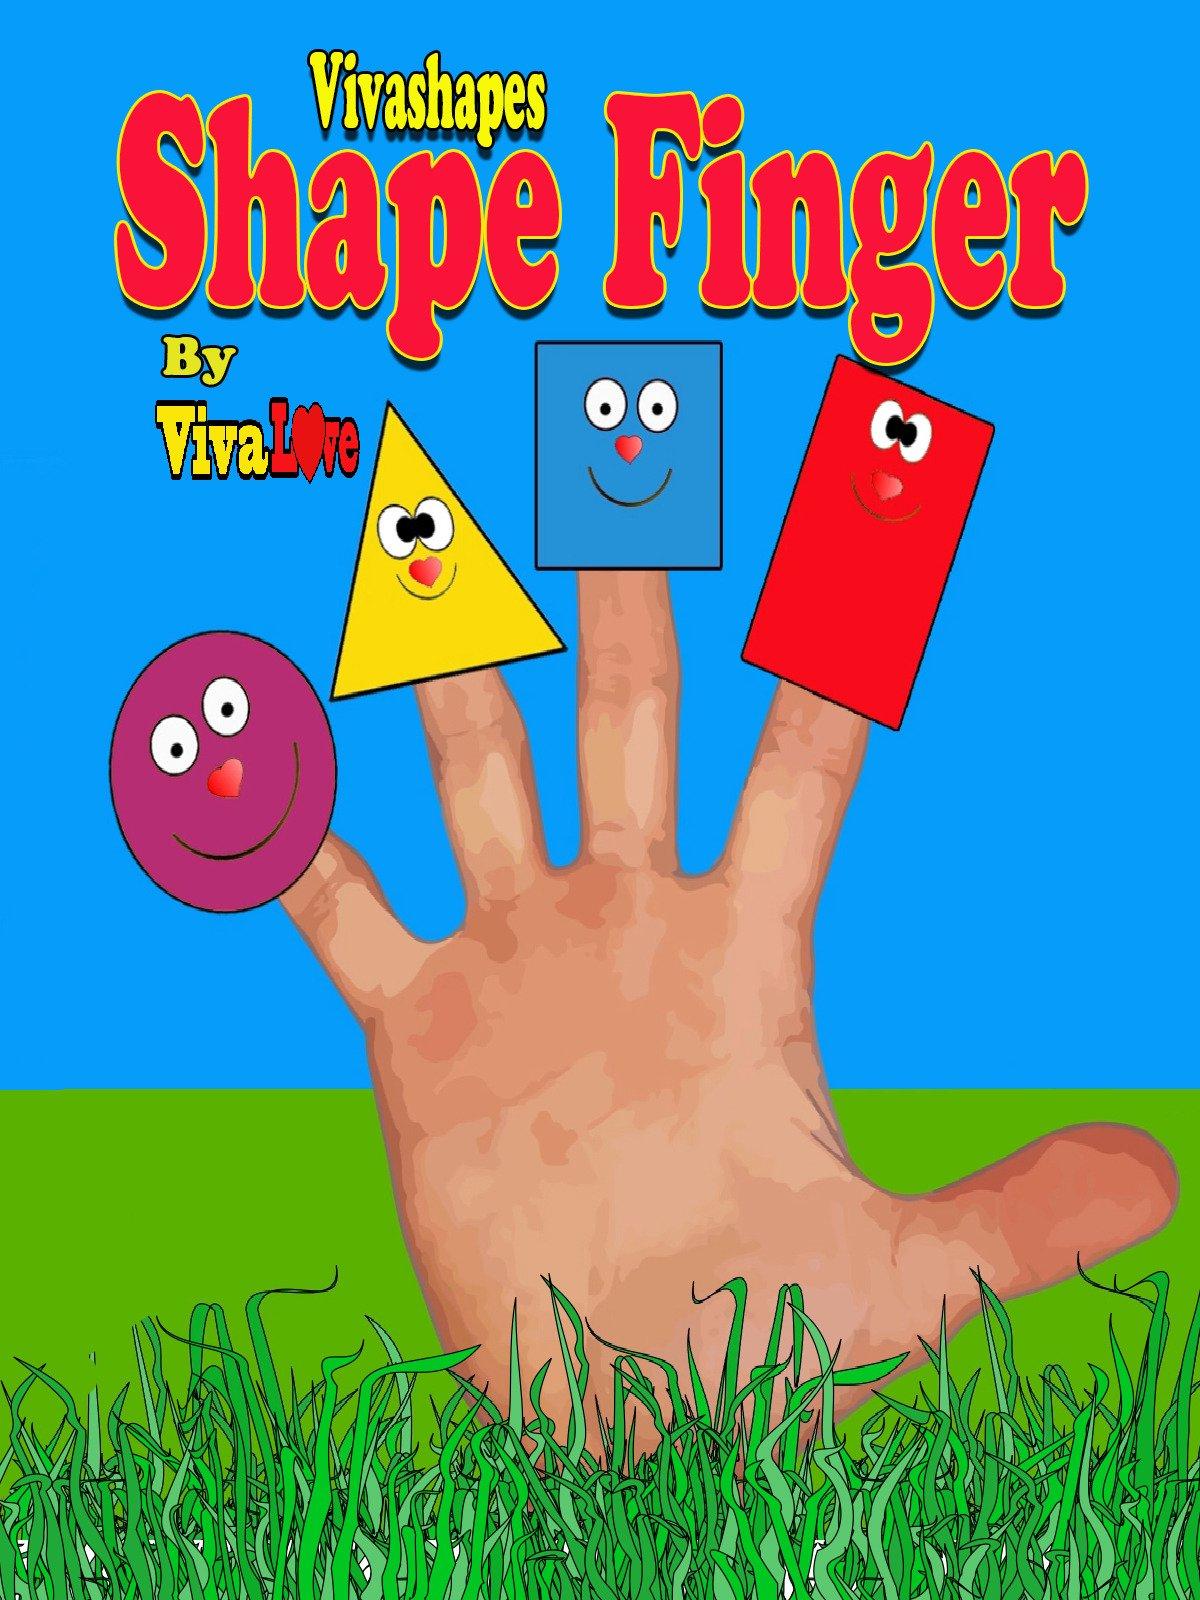 Vivashapes Shape finger. on Amazon Prime Video UK